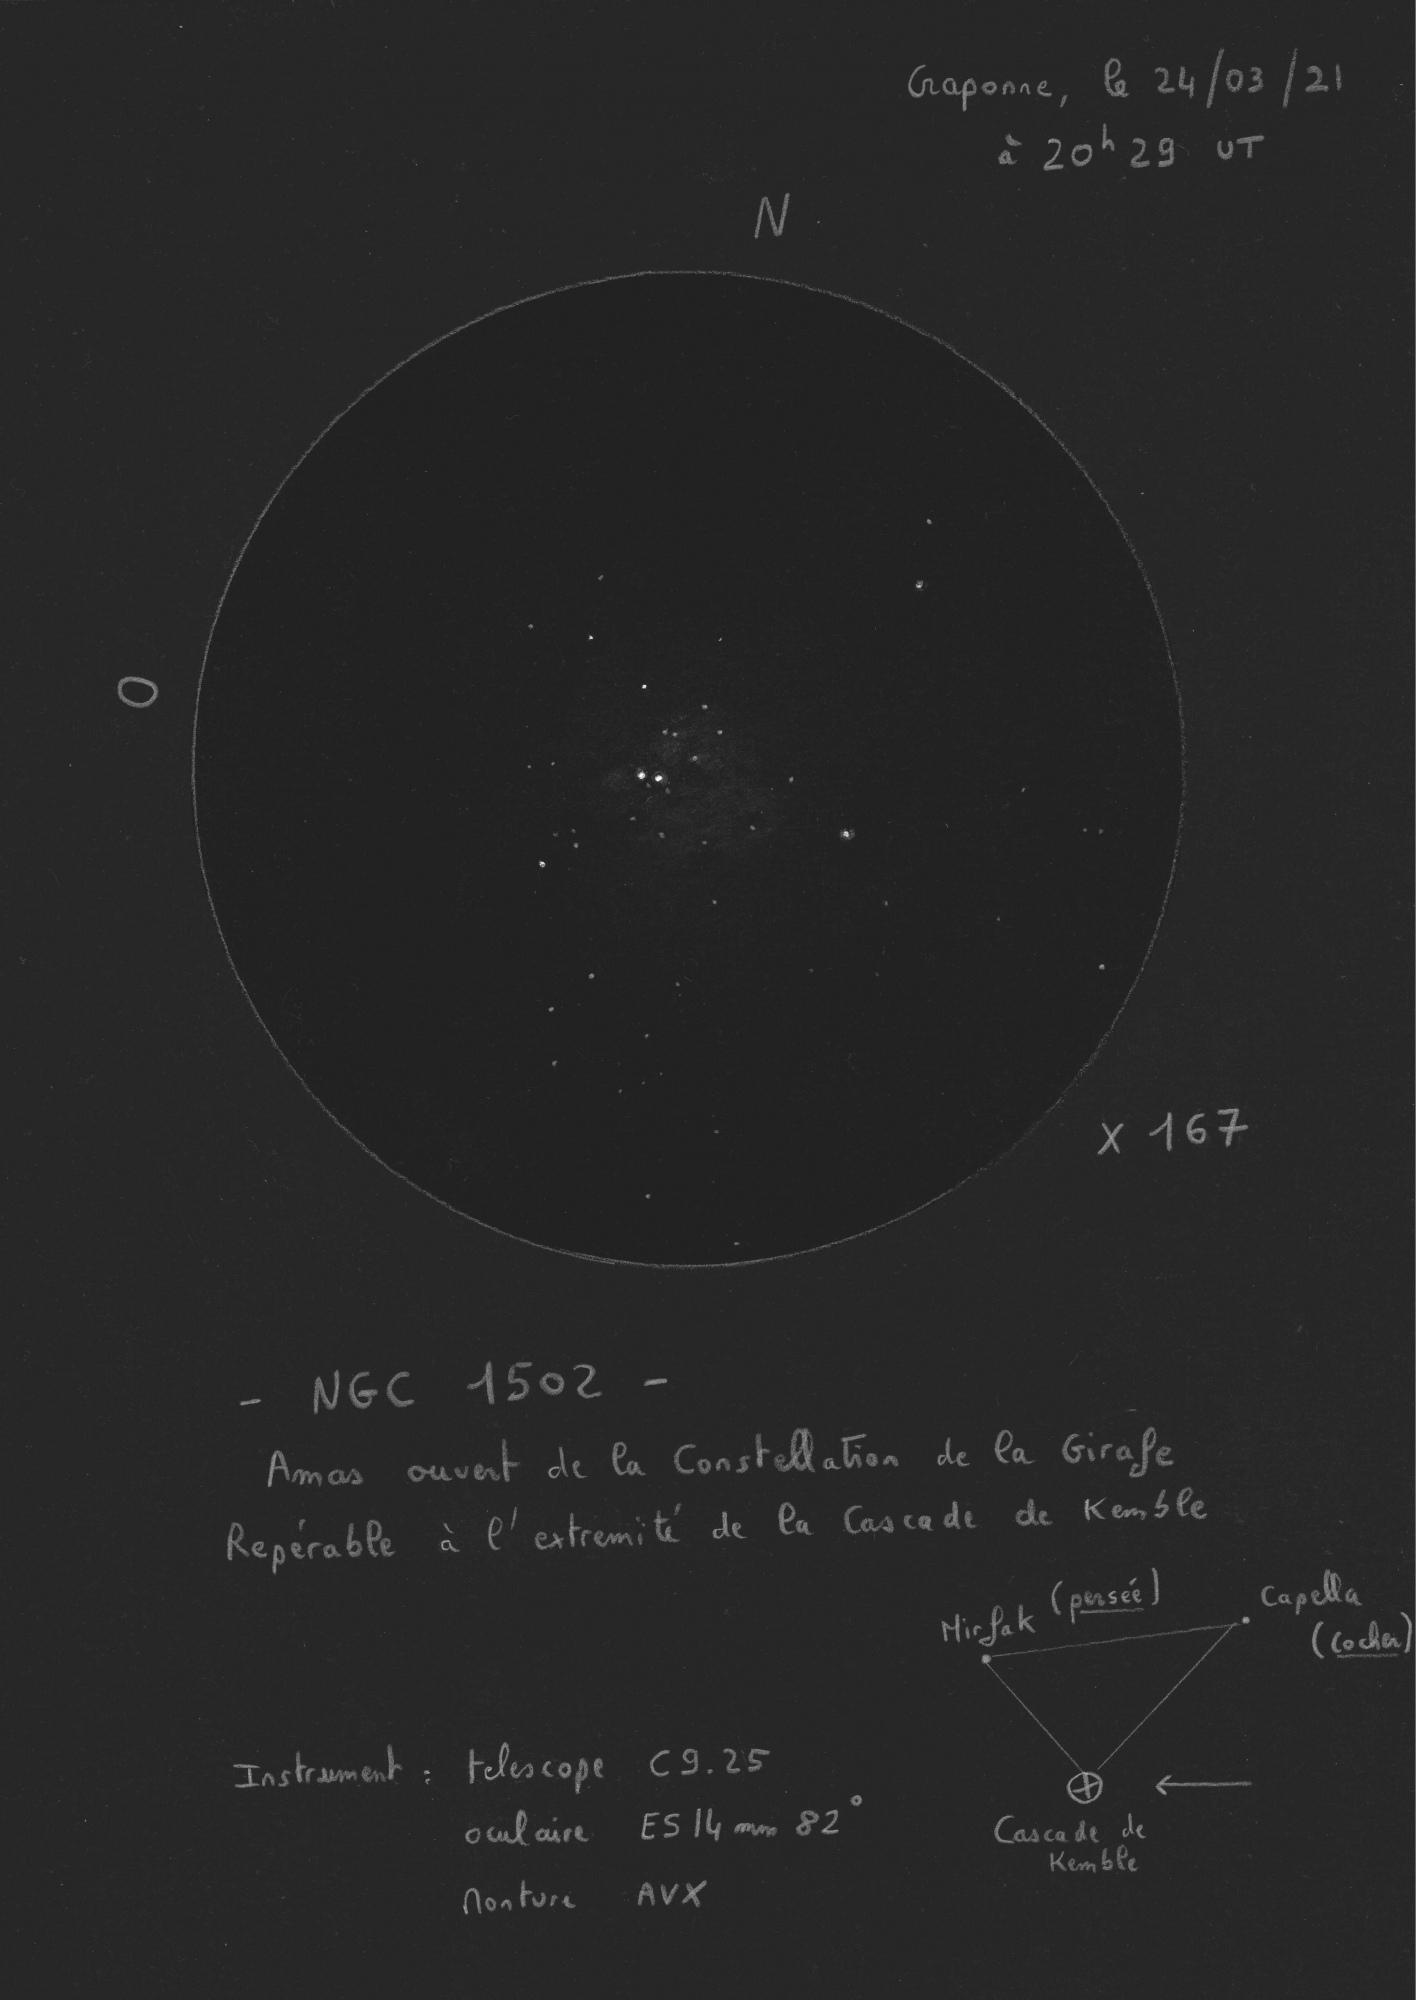 605fa5c4abba0_NGC1502.thumb.jpg.ce6924726203a201a84360c1c883274d.jpg